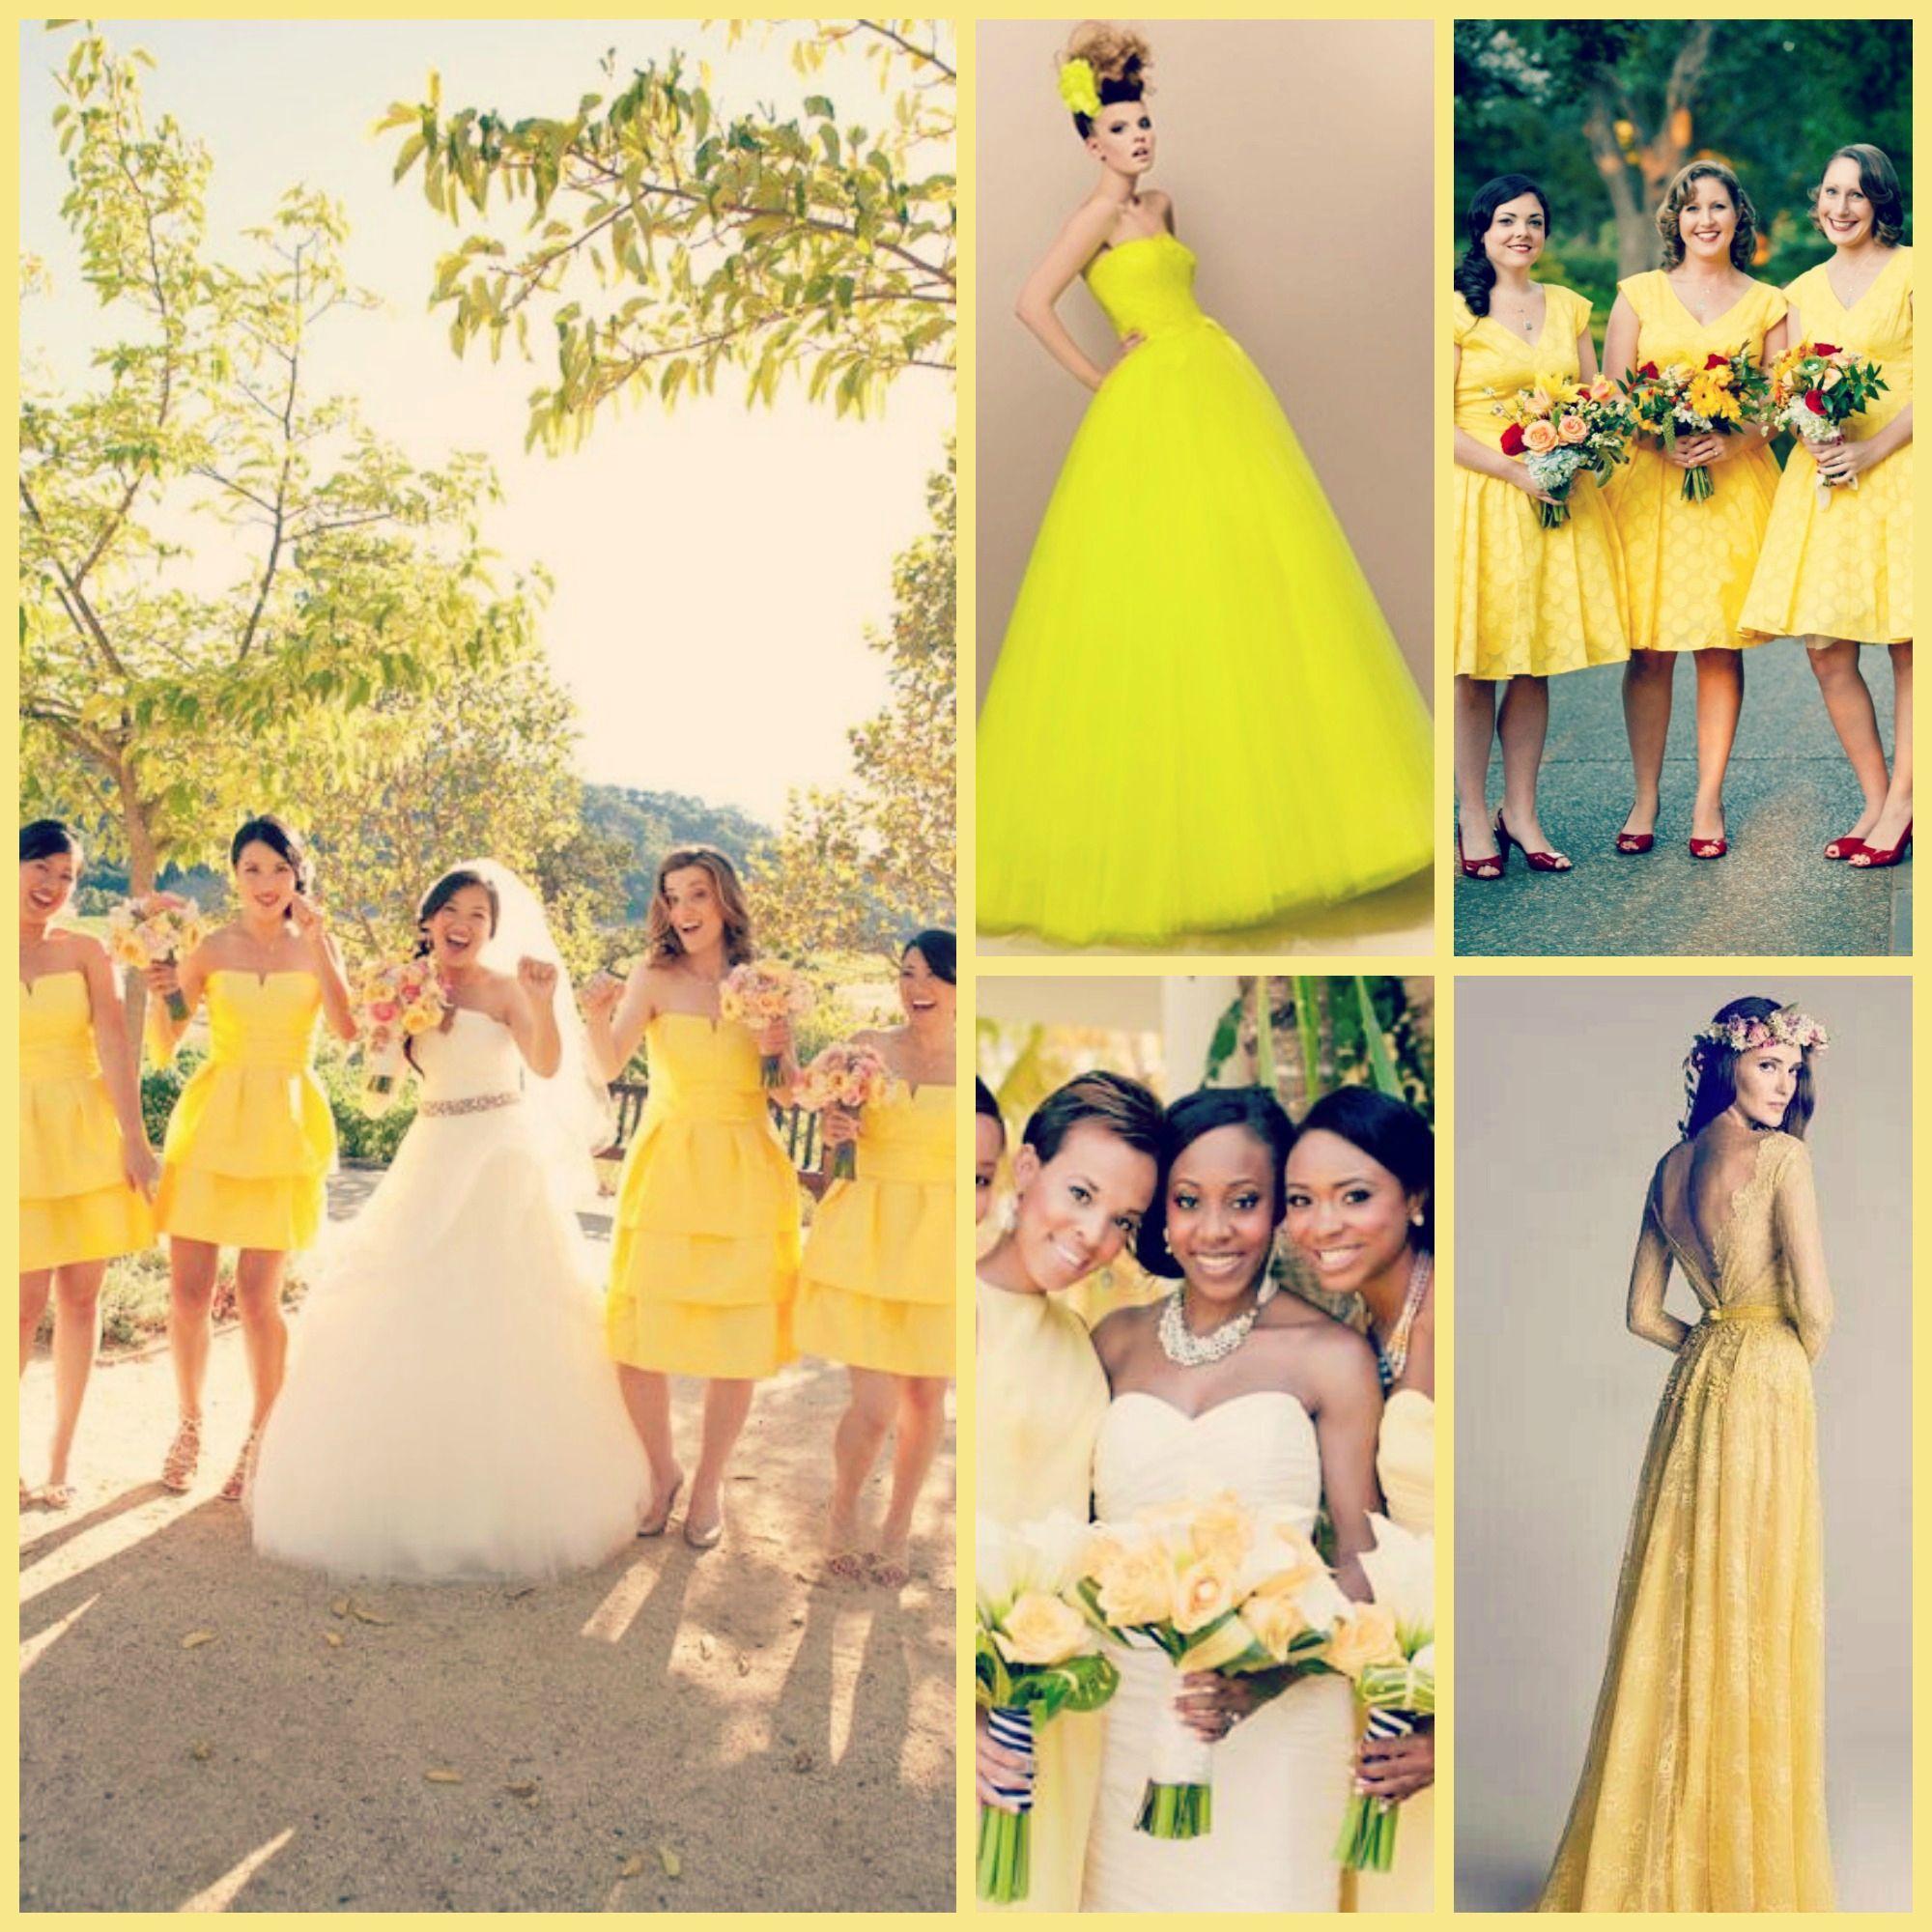 1a38e818cf8 ROBES JAUNES MARIAGE Robe Demoiselle D honneur Jaune